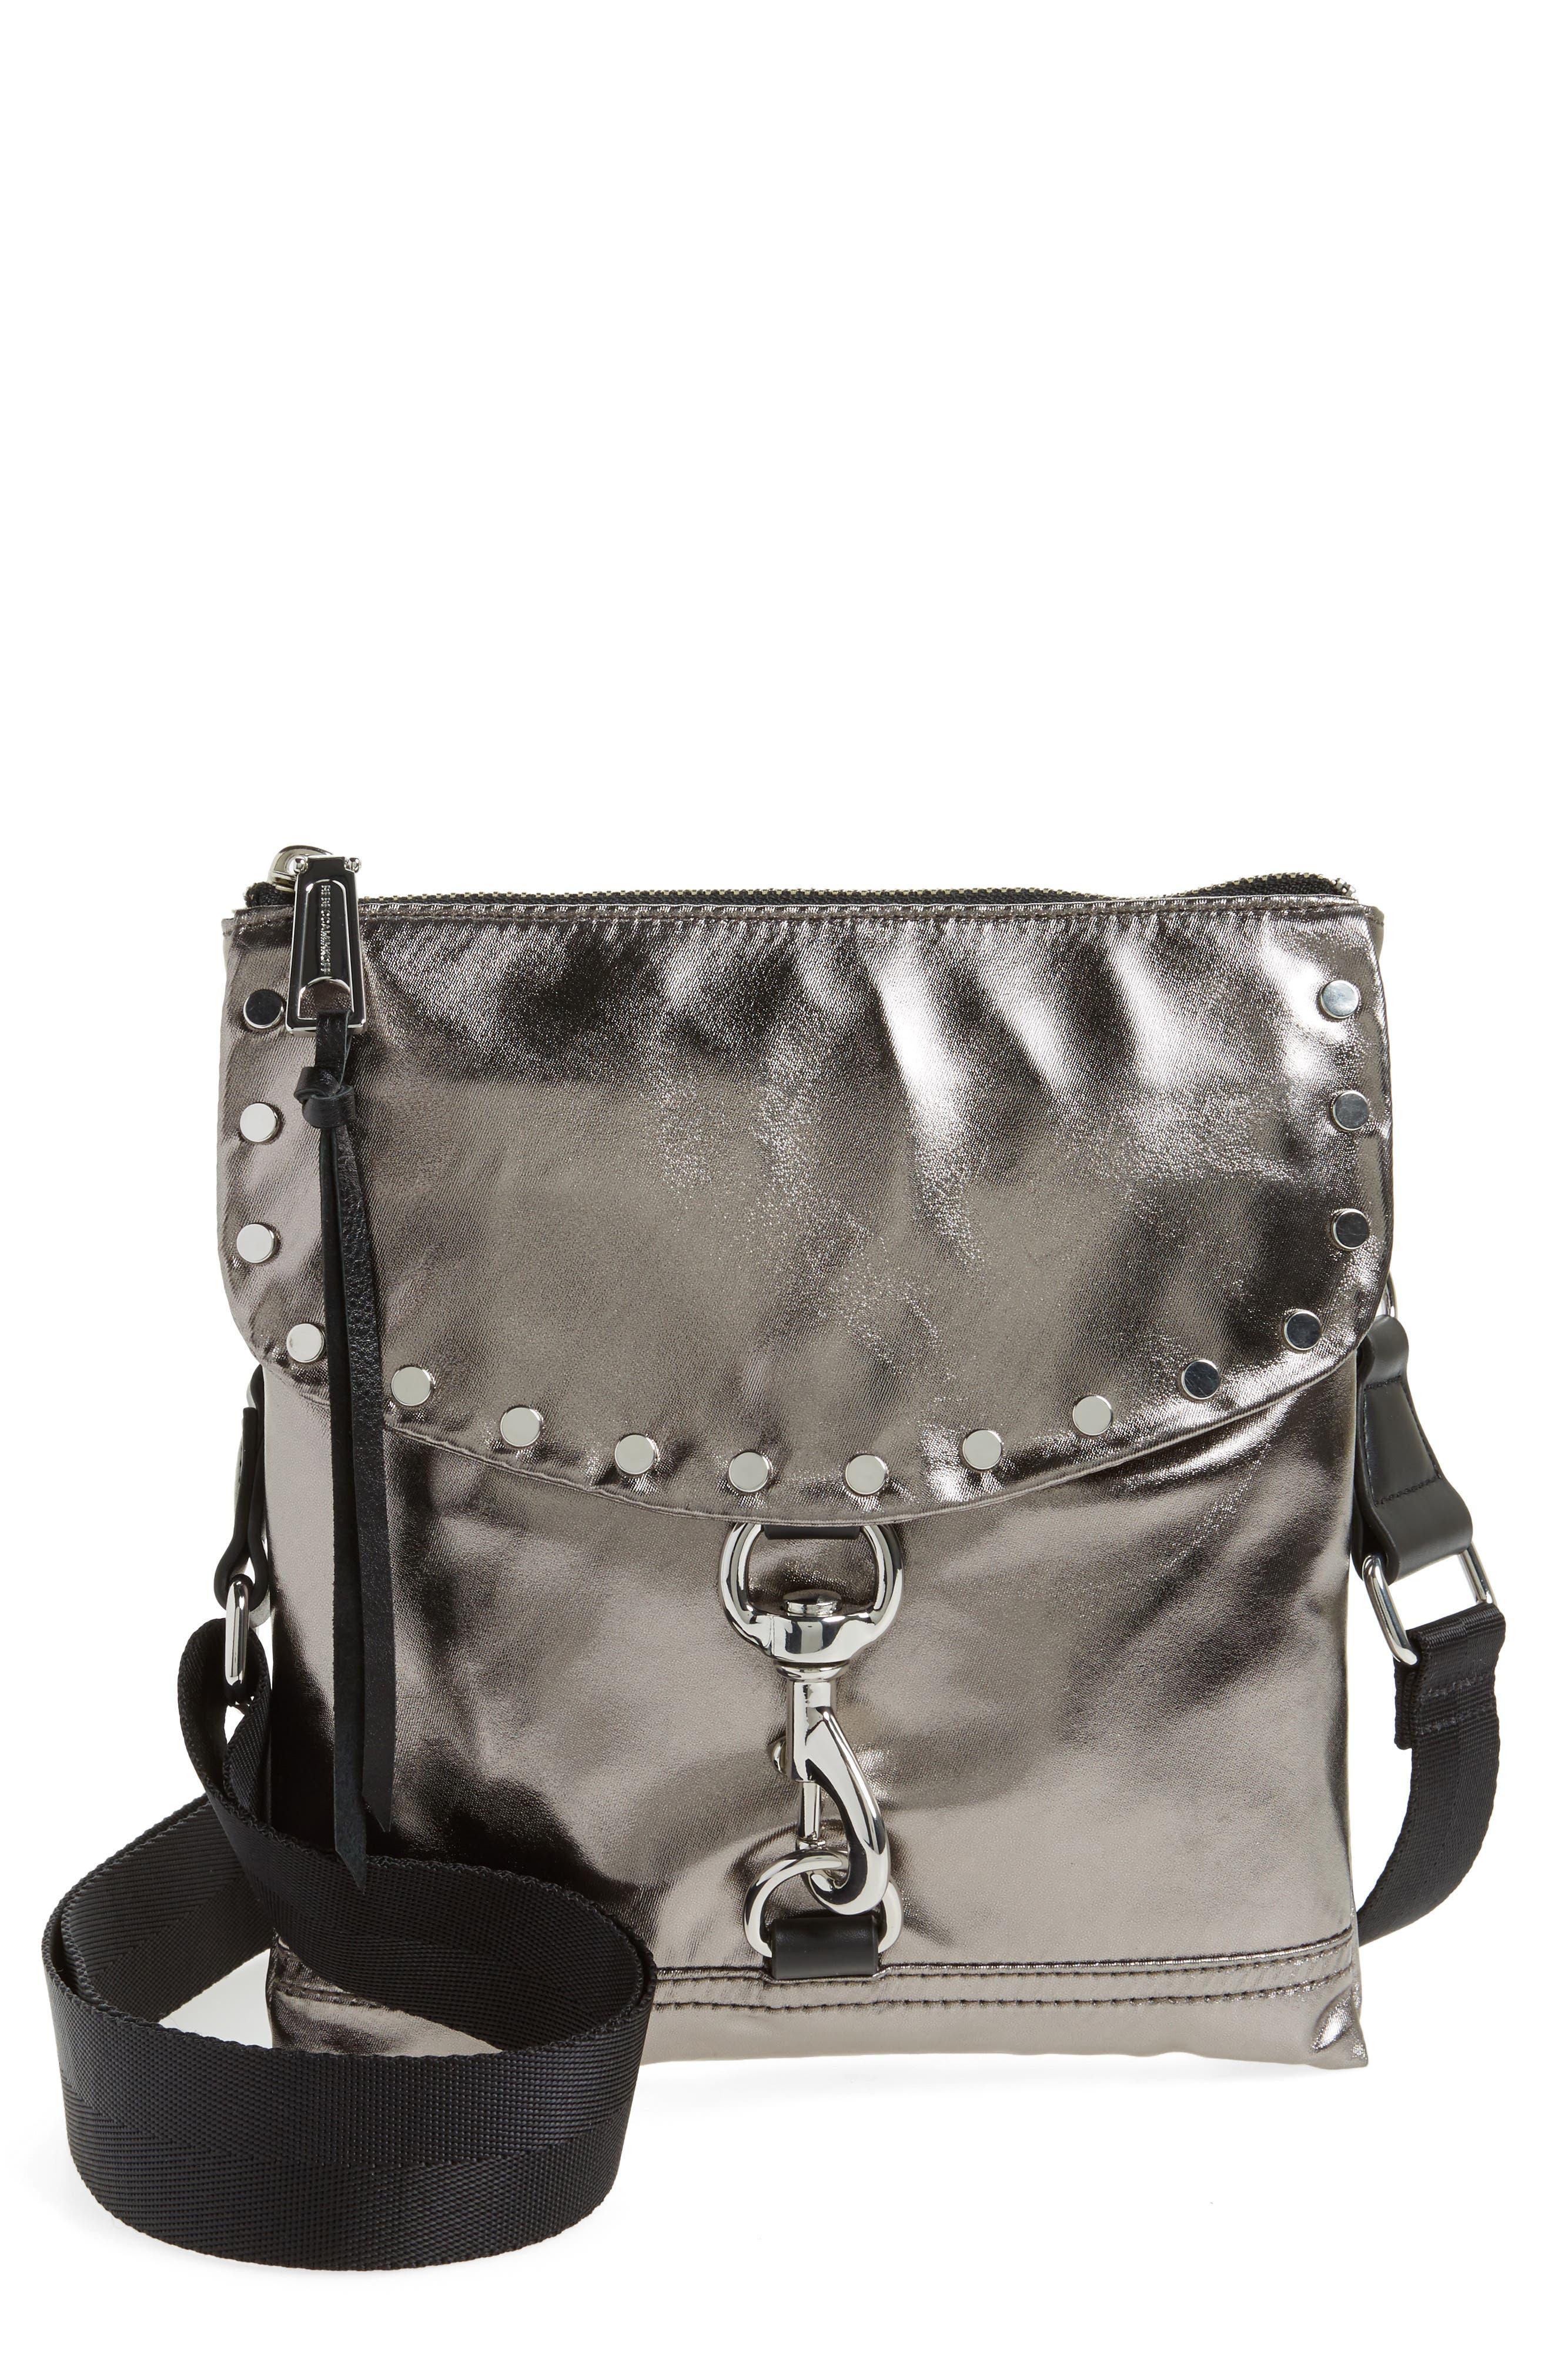 Alternate Image 1 Selected - Rebecca Minkoff Nylon Flap Crossbody Bag